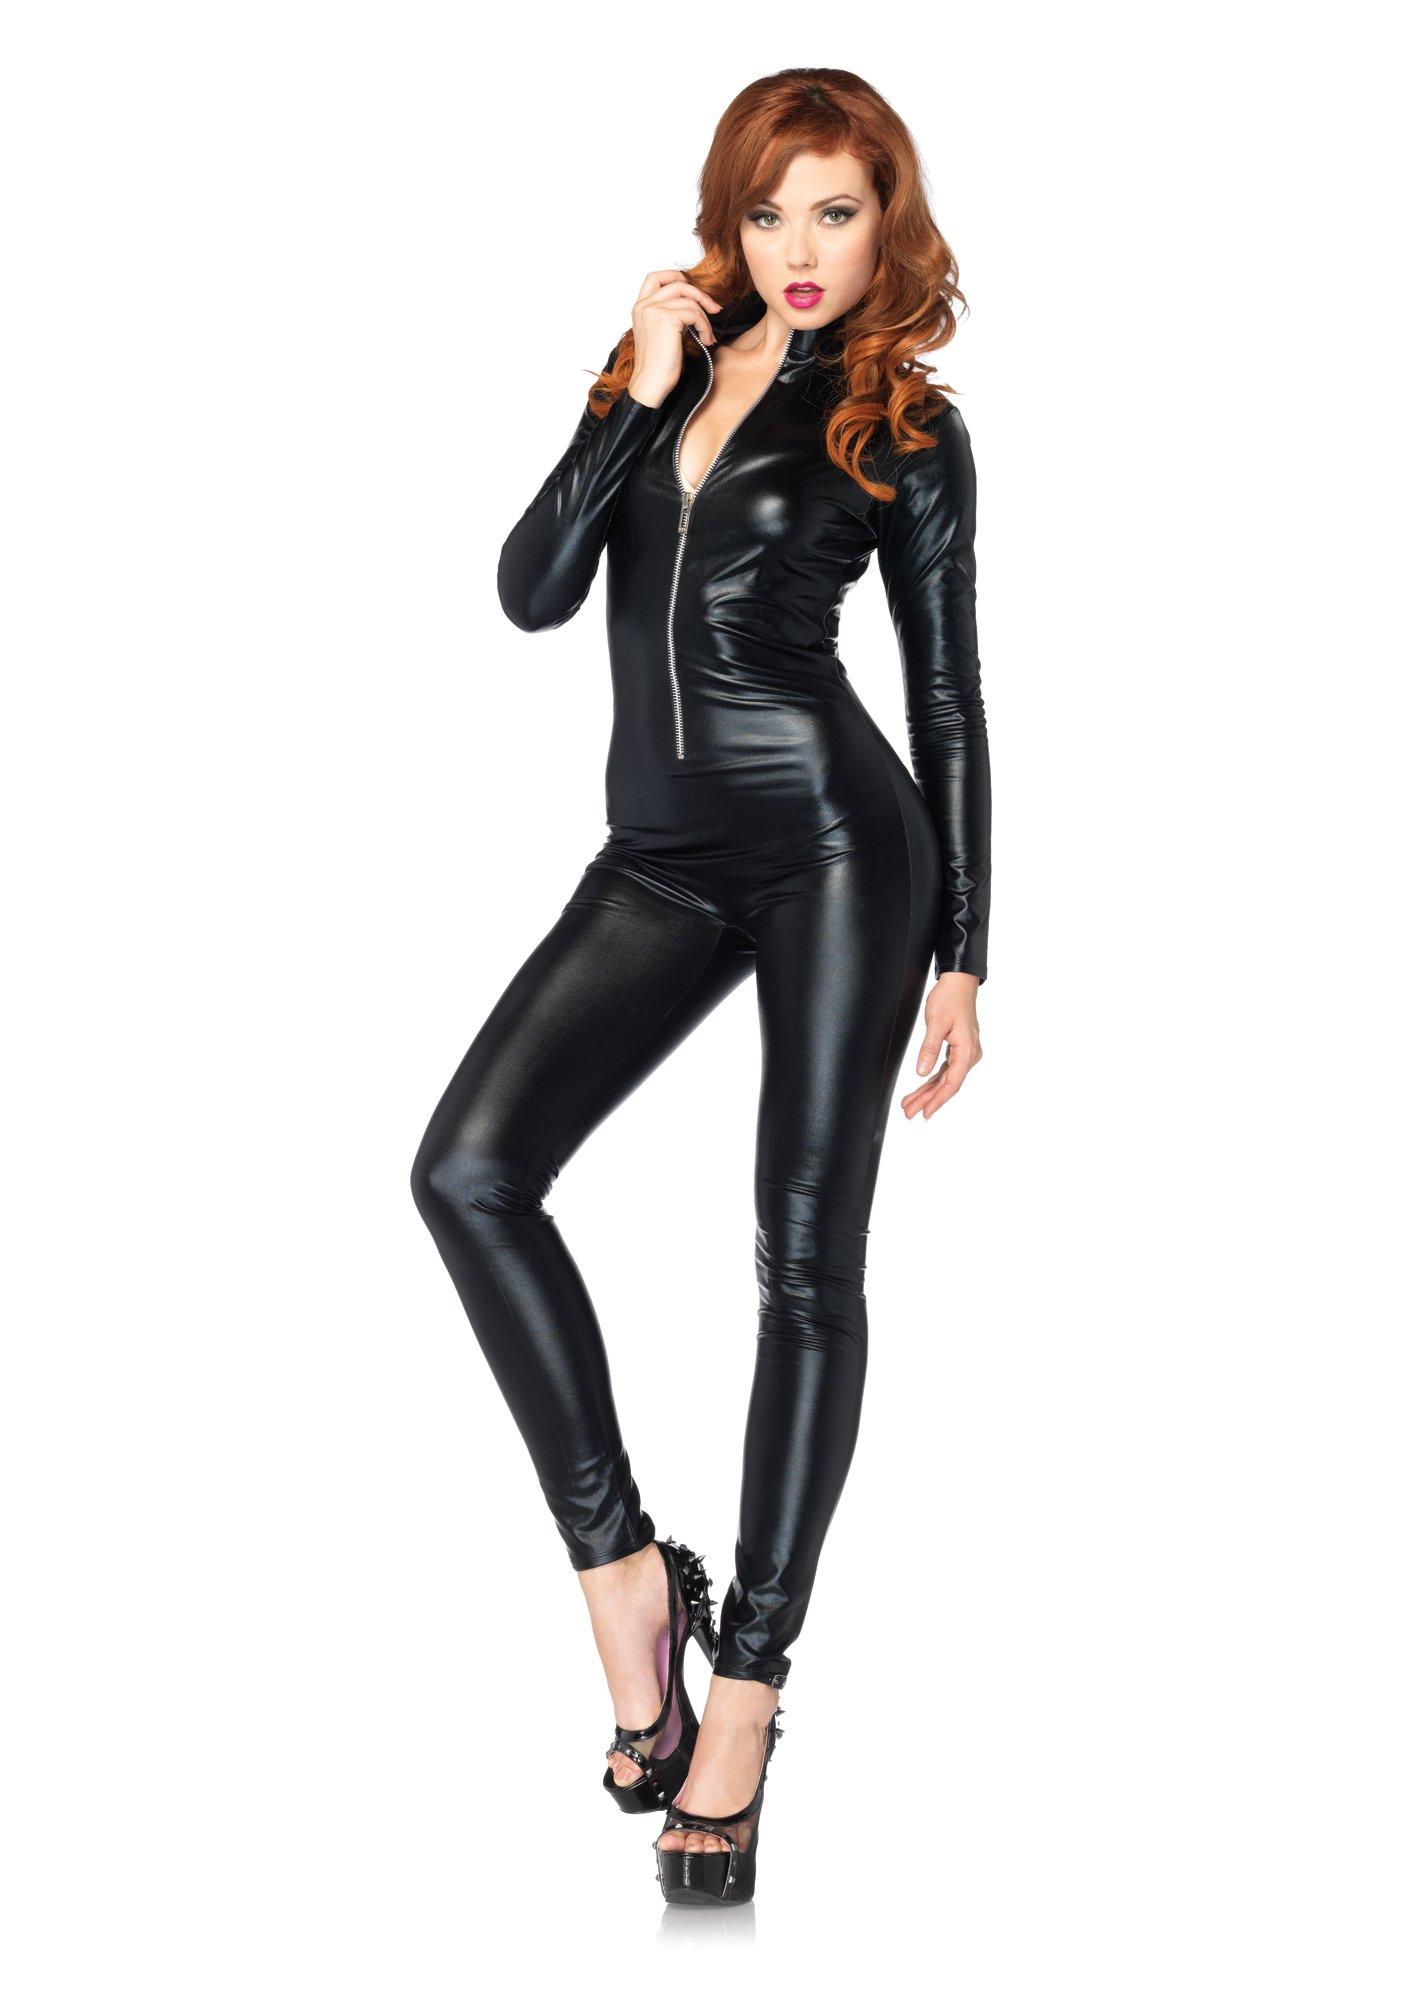 Leg Avenue Women's Wet Look Zipper Front Cat Suit, Black, Medium